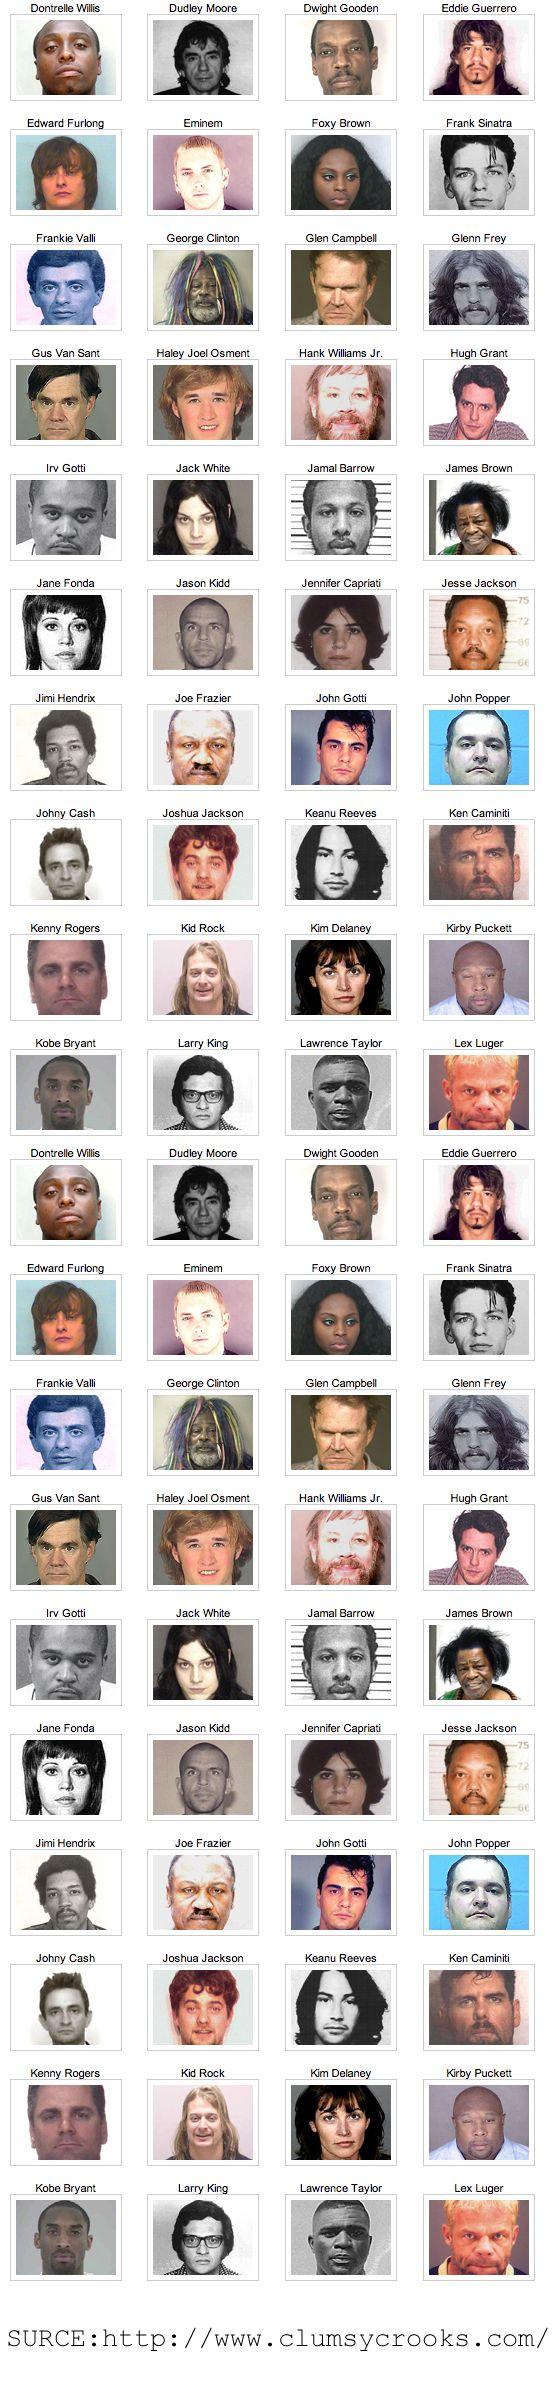 Celebrity Mug Shots! Everyone has one!